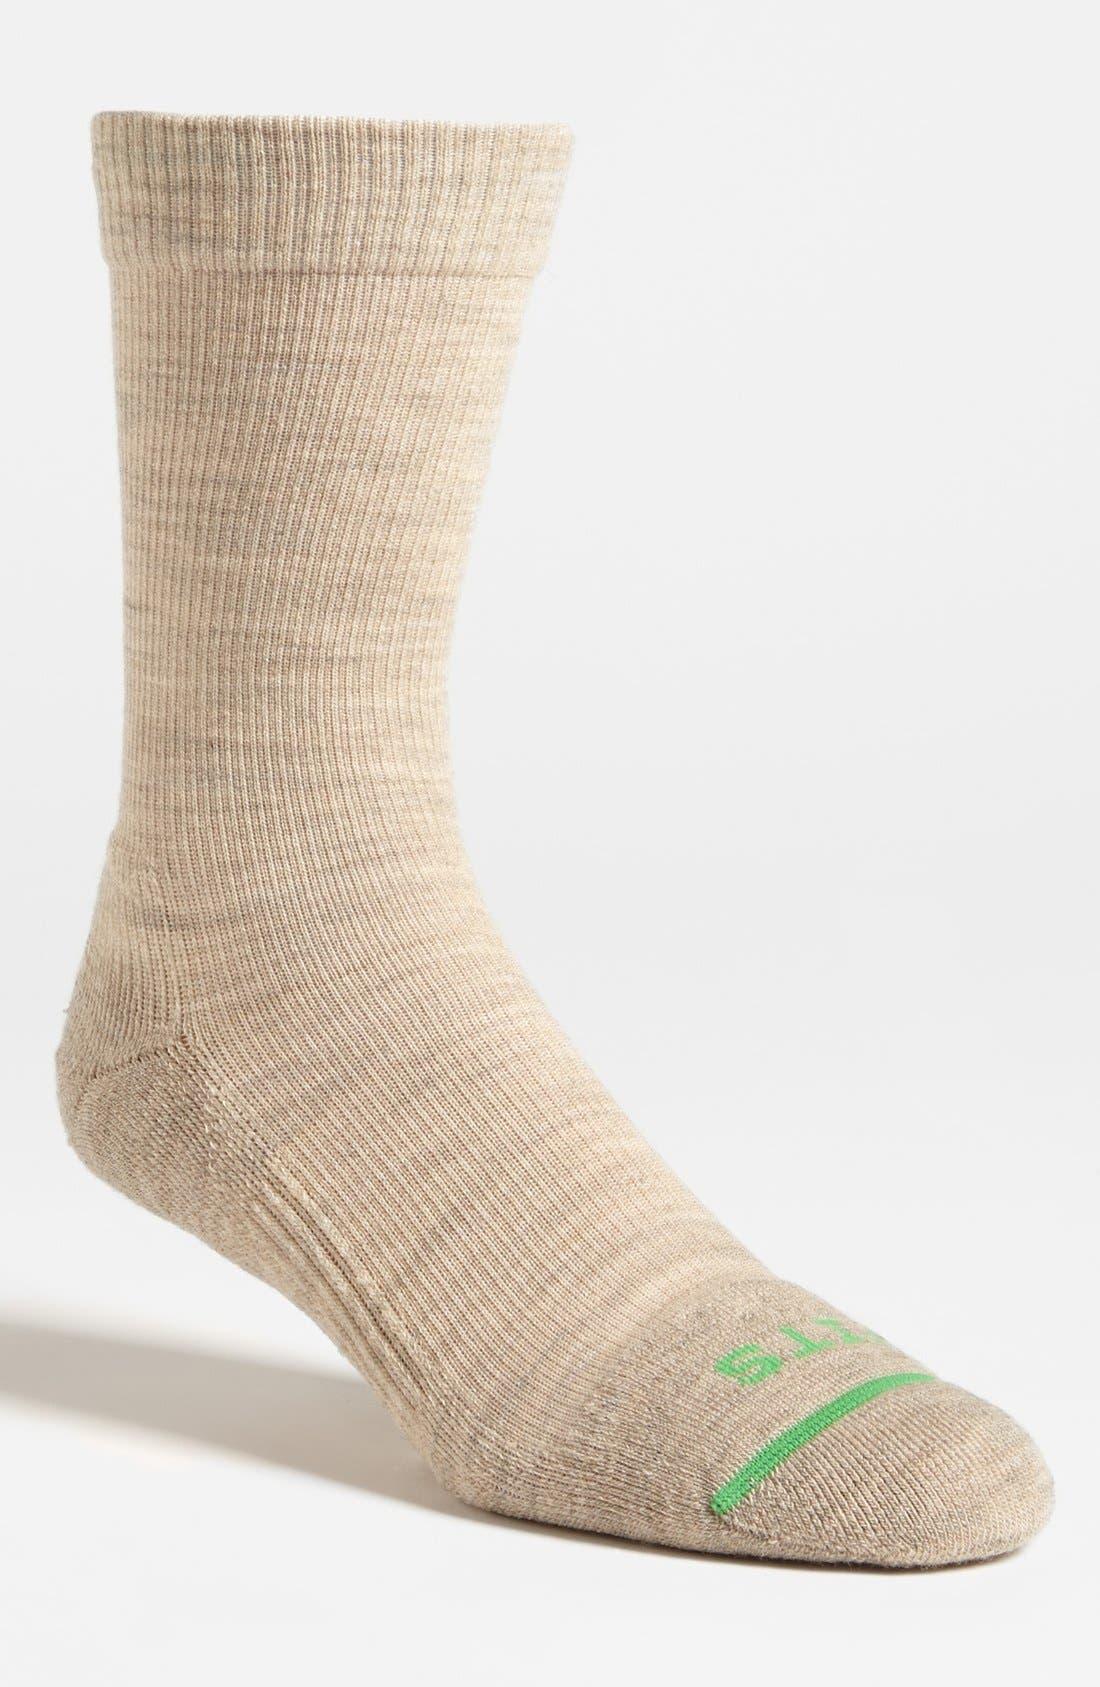 Alternate Image 1 Selected - FITS Sock Co. Crew Socks